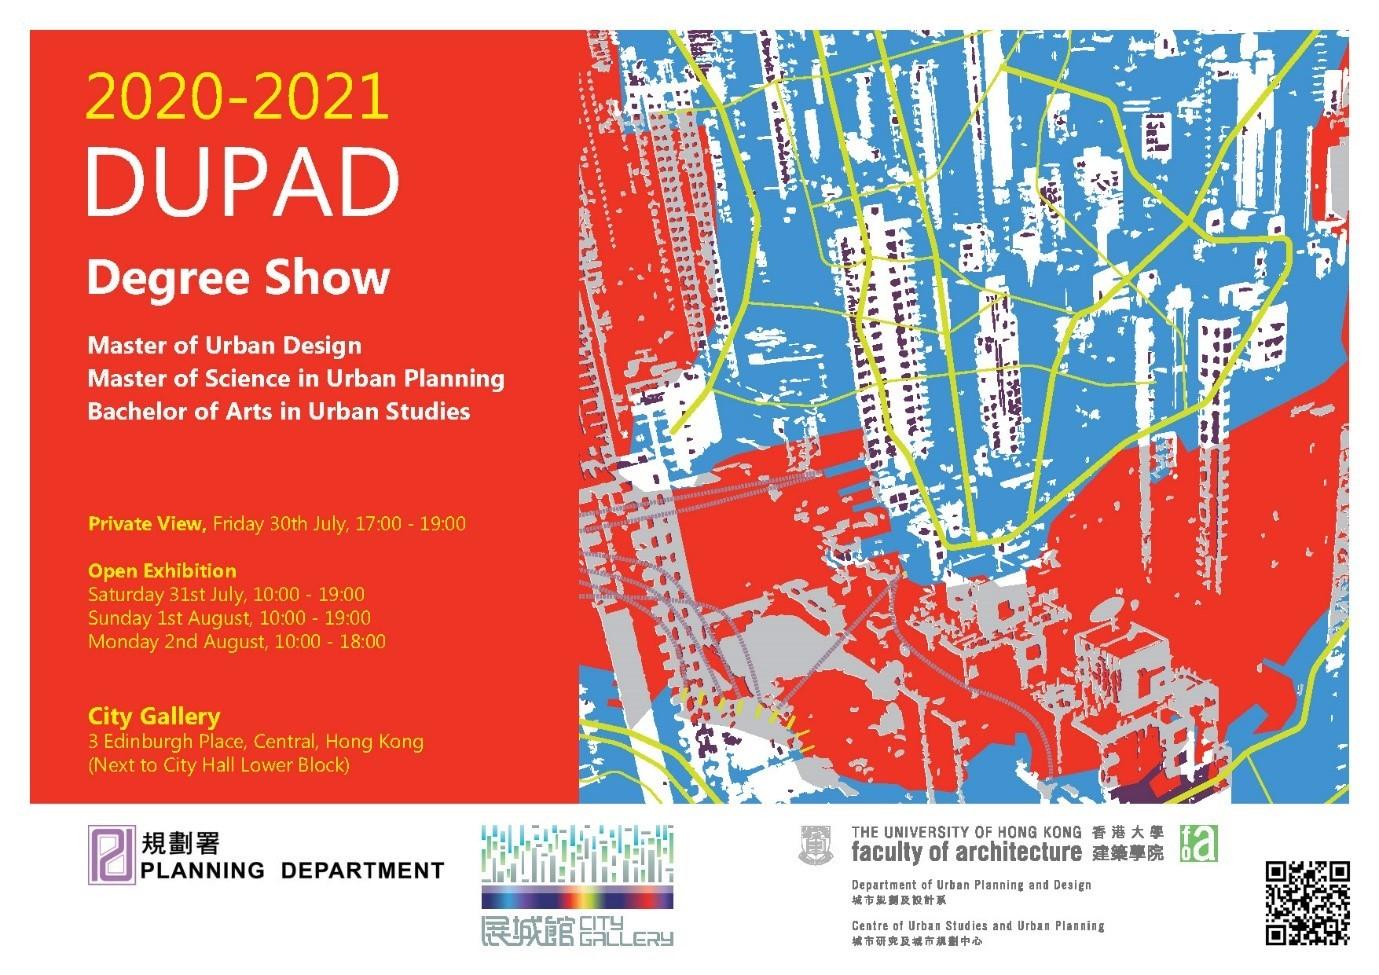 2020-2021 DUPAD Degree Show